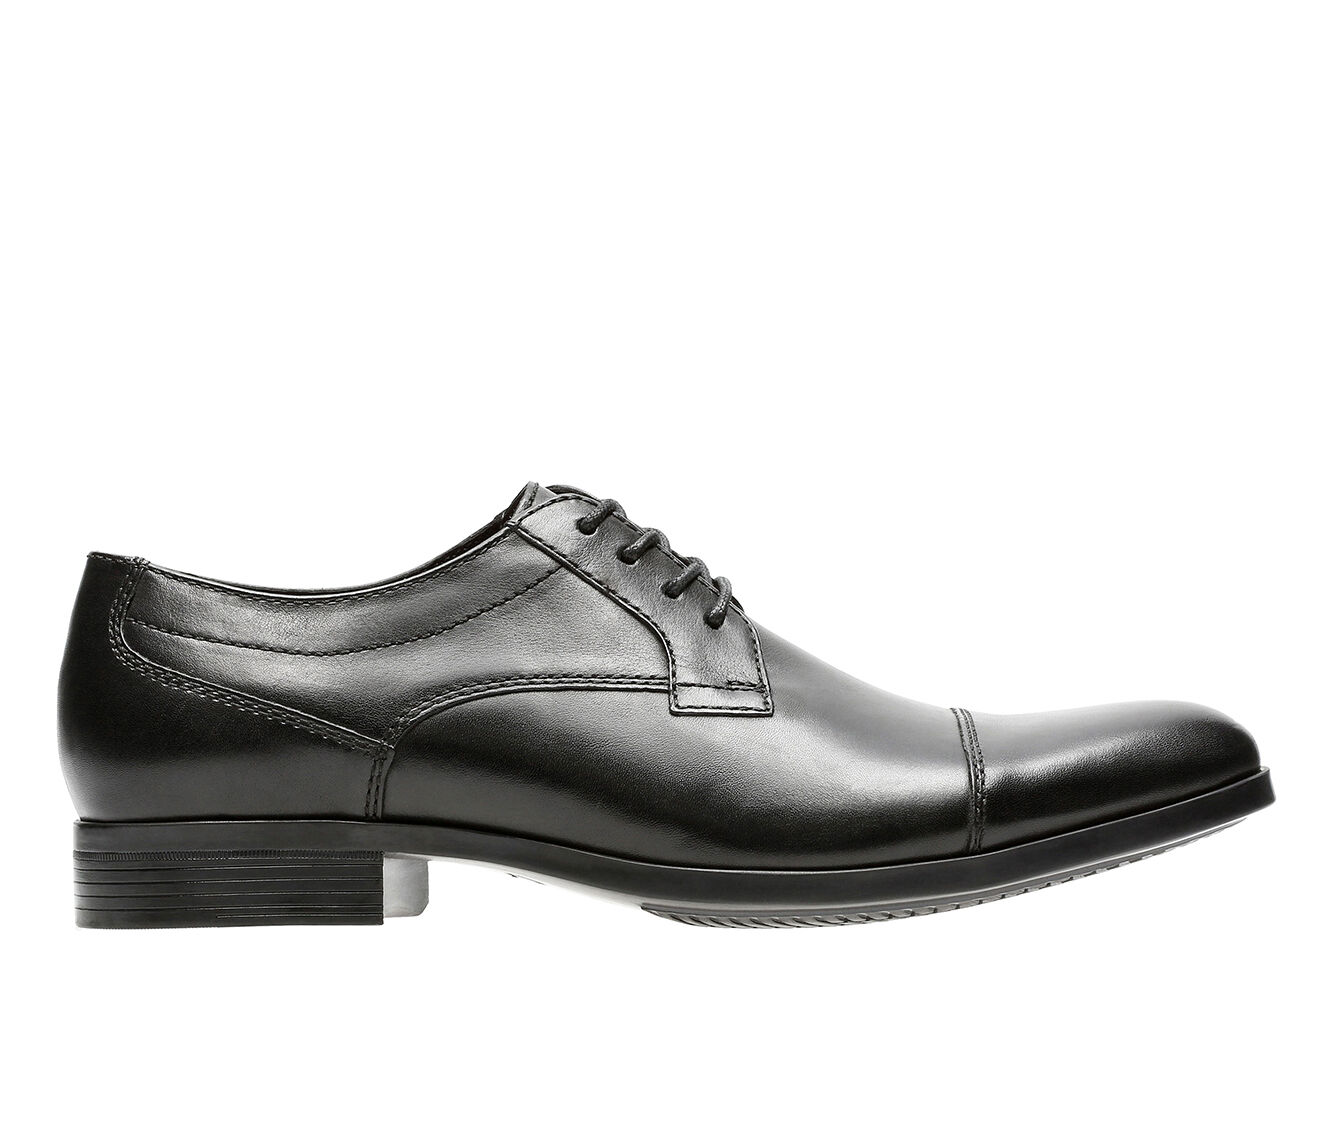 new arrivals Men's Clarks Conwell Cap Dress Shoes Black